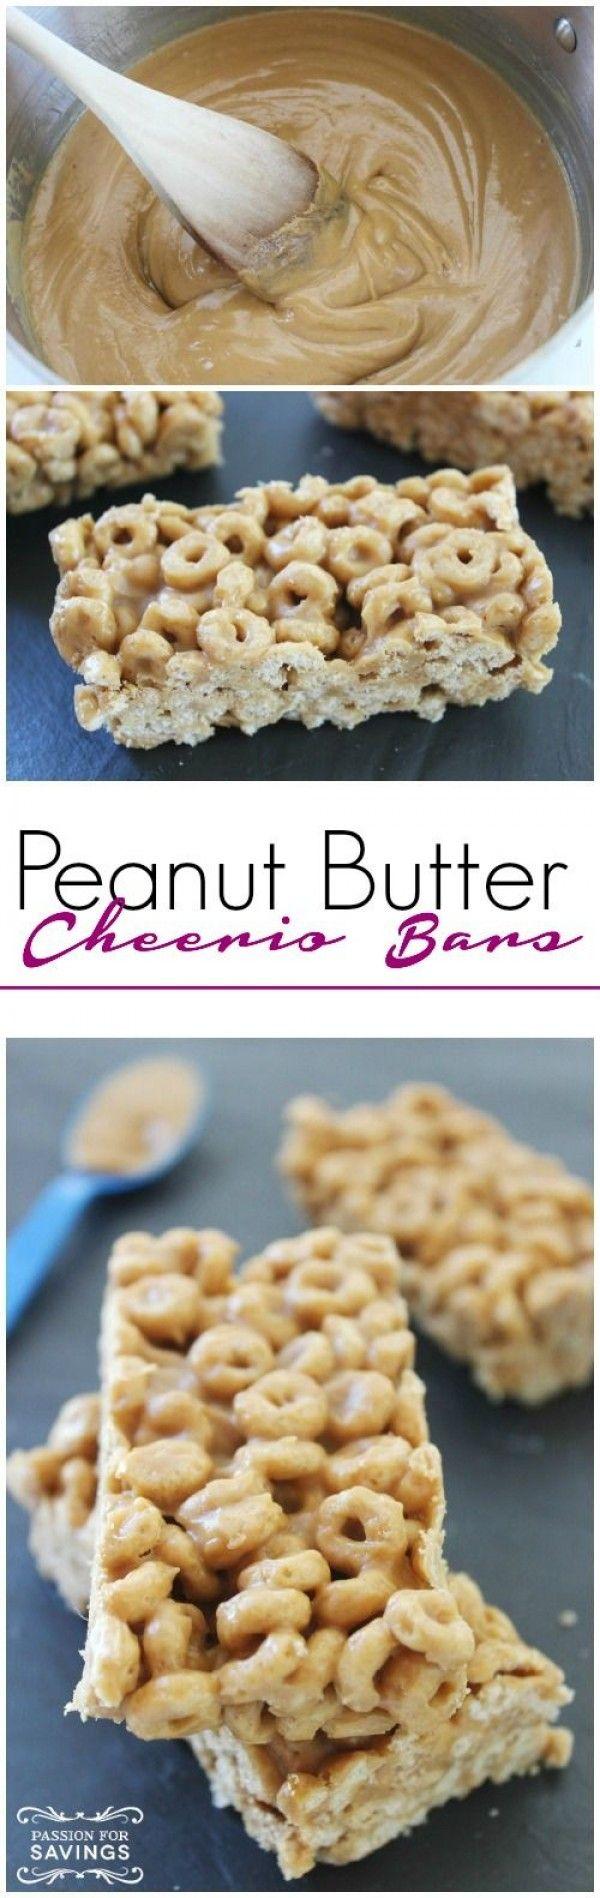 Get the recipe Peanut Butter Cheerio Bars @recipes_to_go